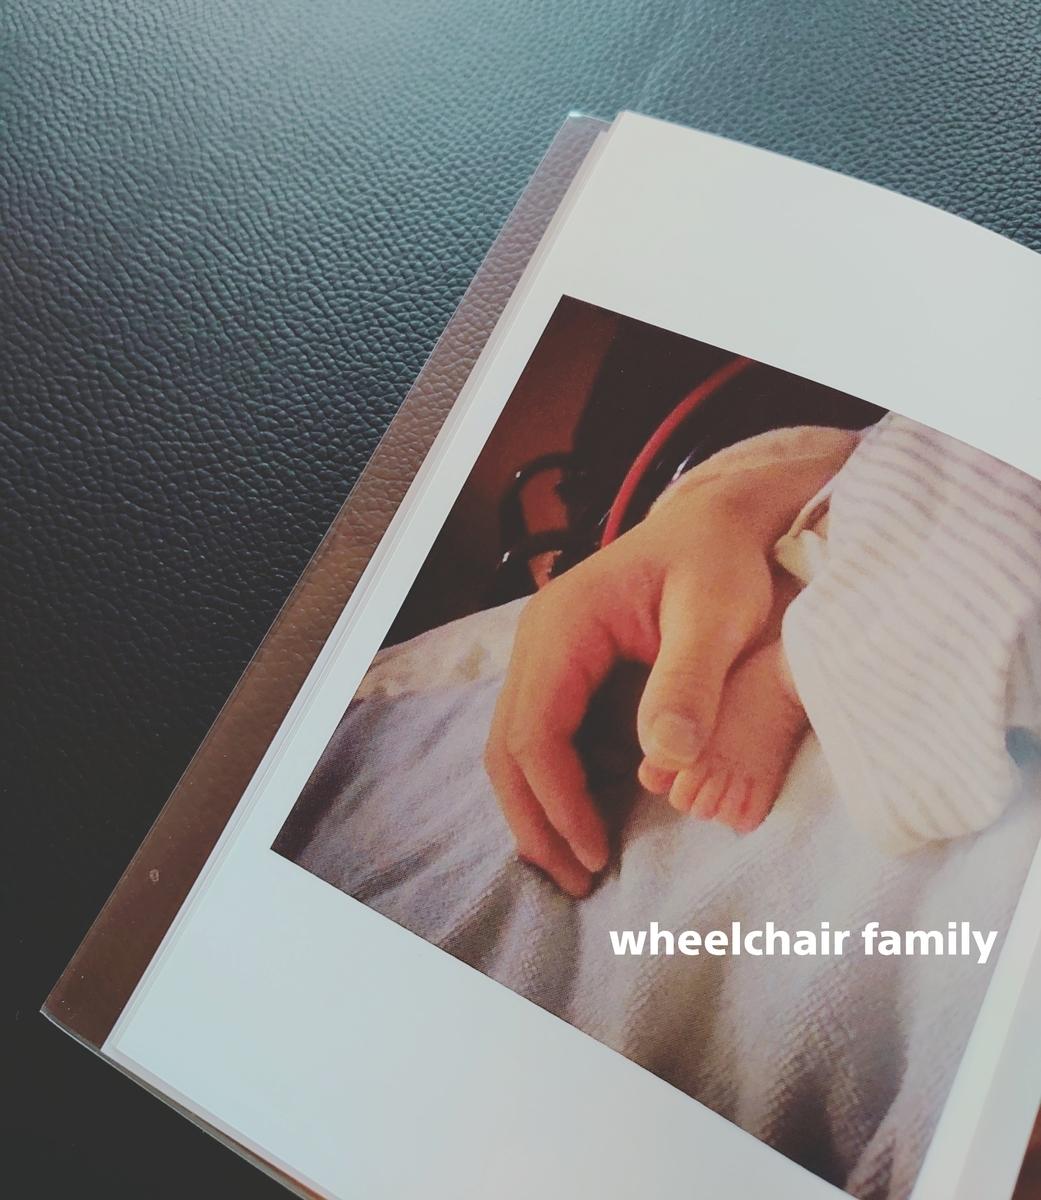 f:id:WheelchairFamily:20190926144256j:plain